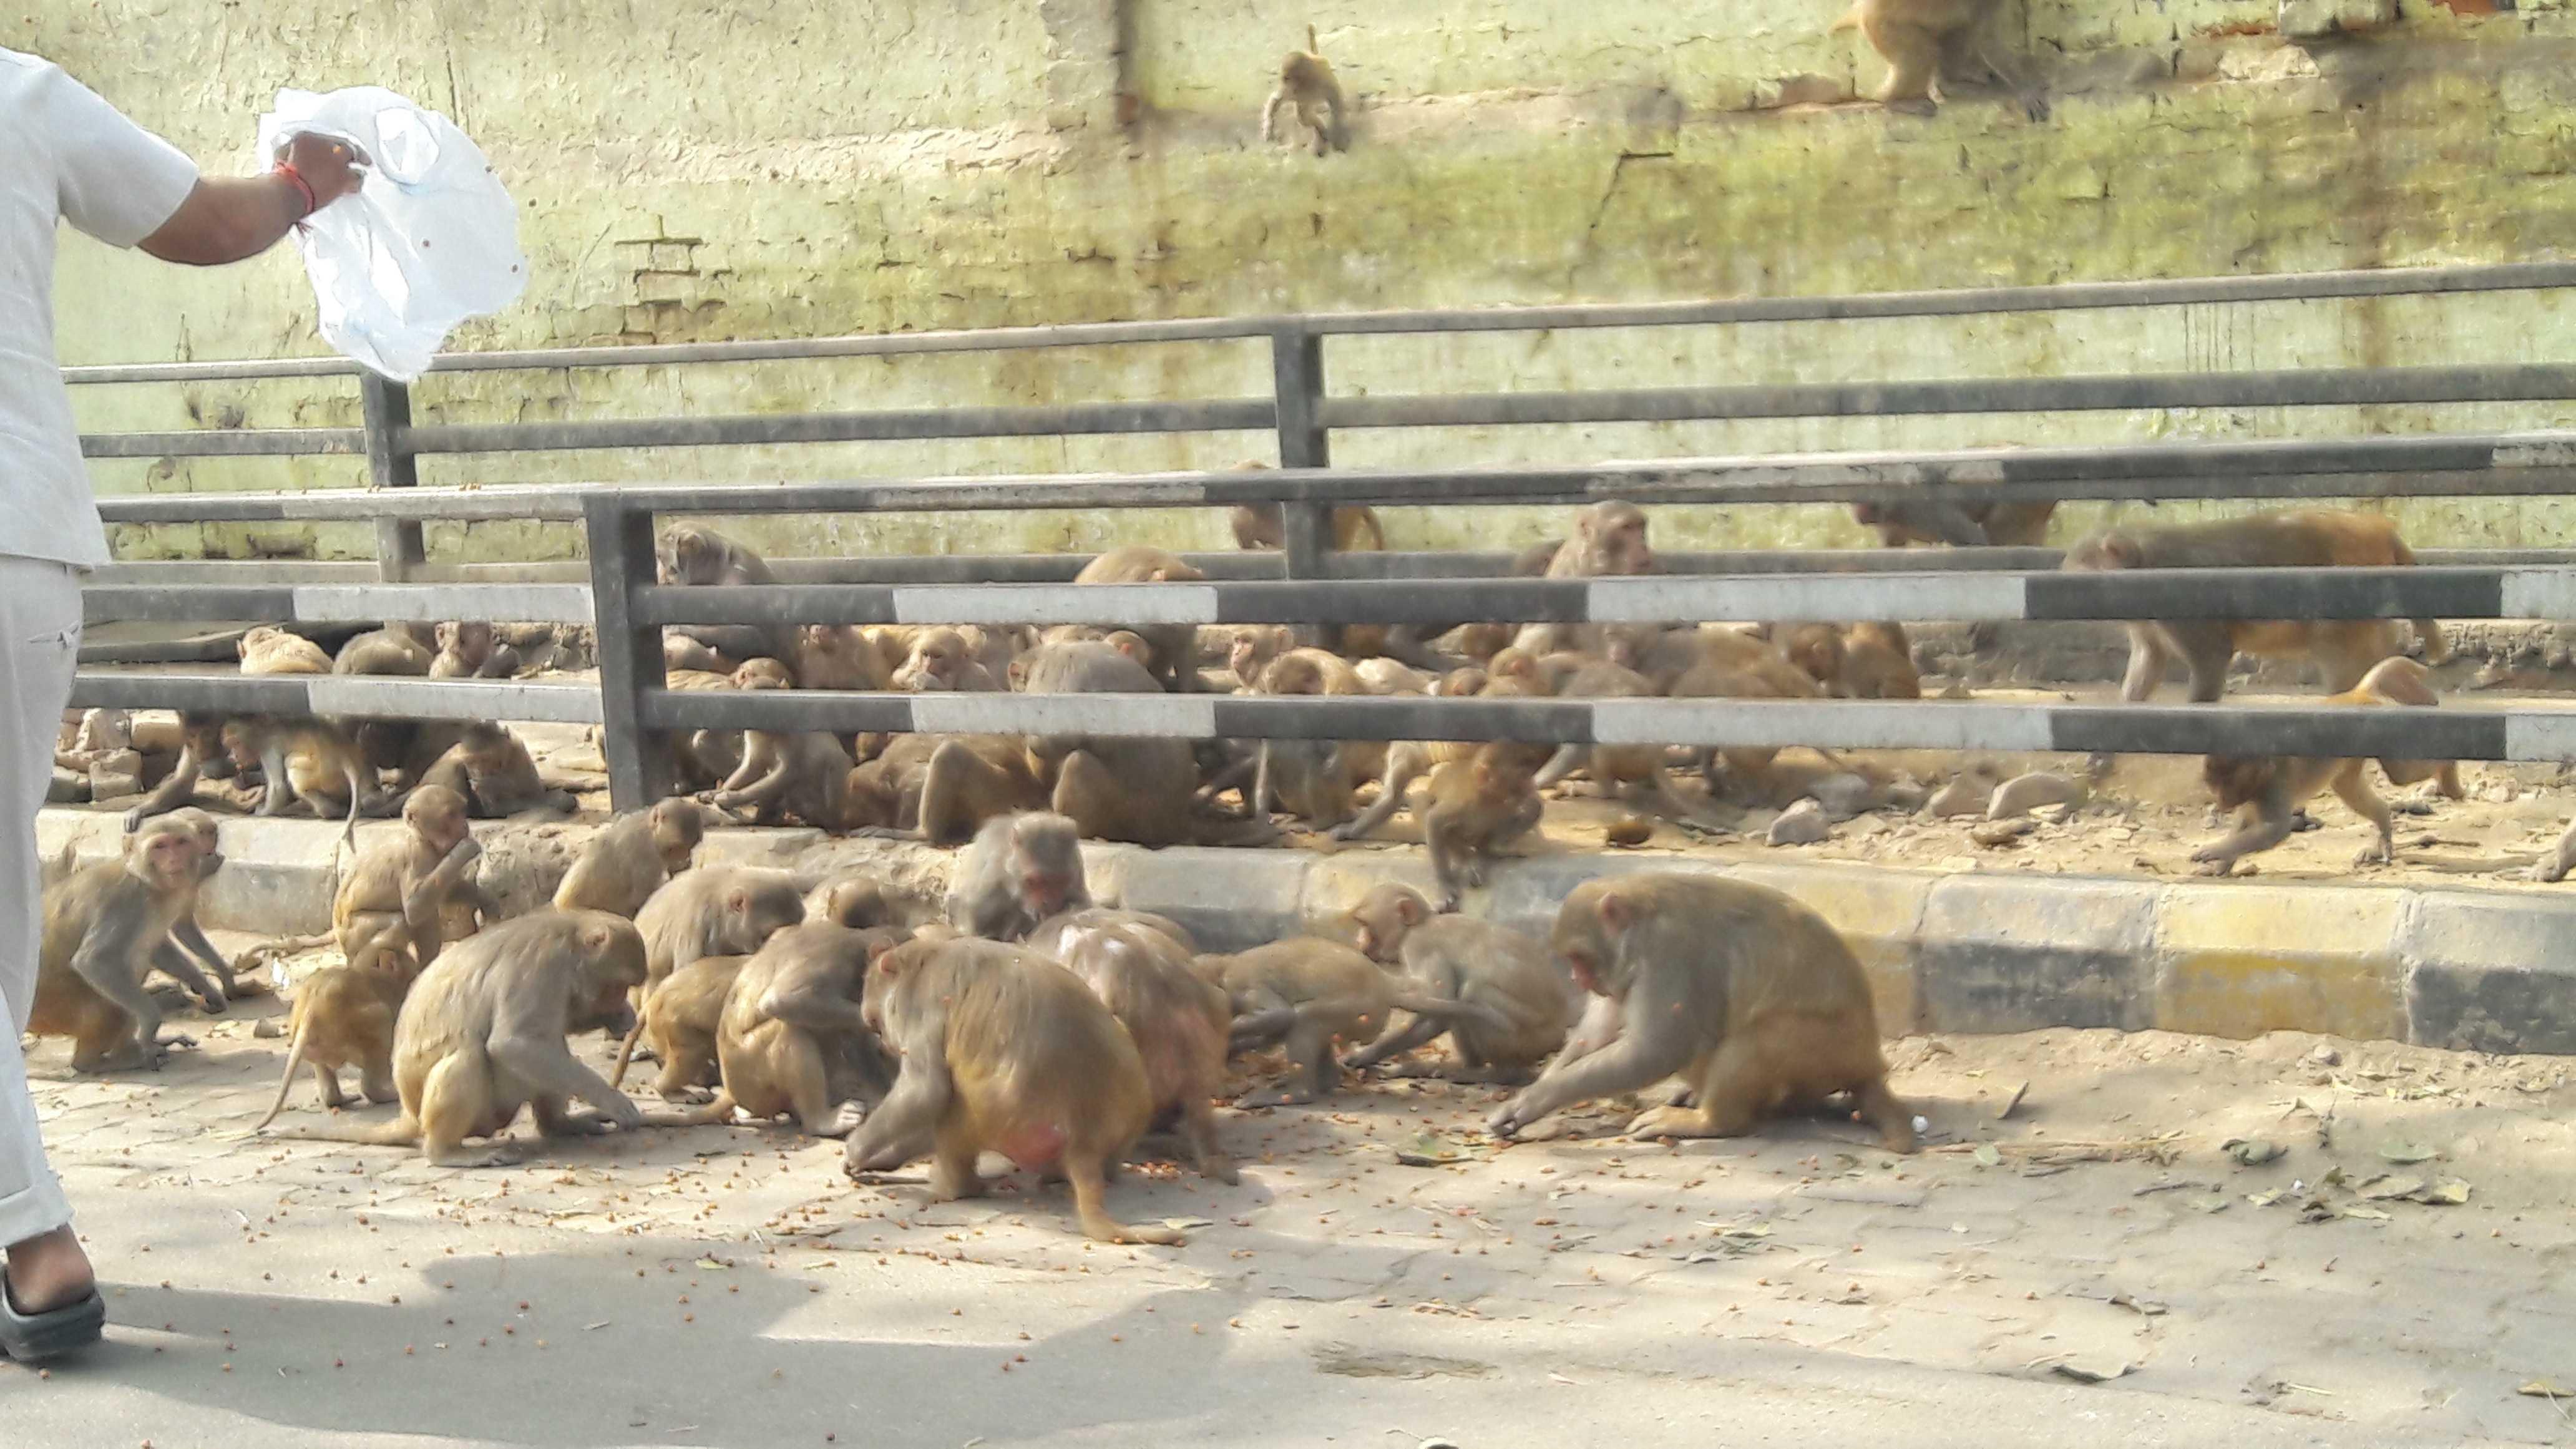 Feeding monkeys with corn and peanuts-fnbworld